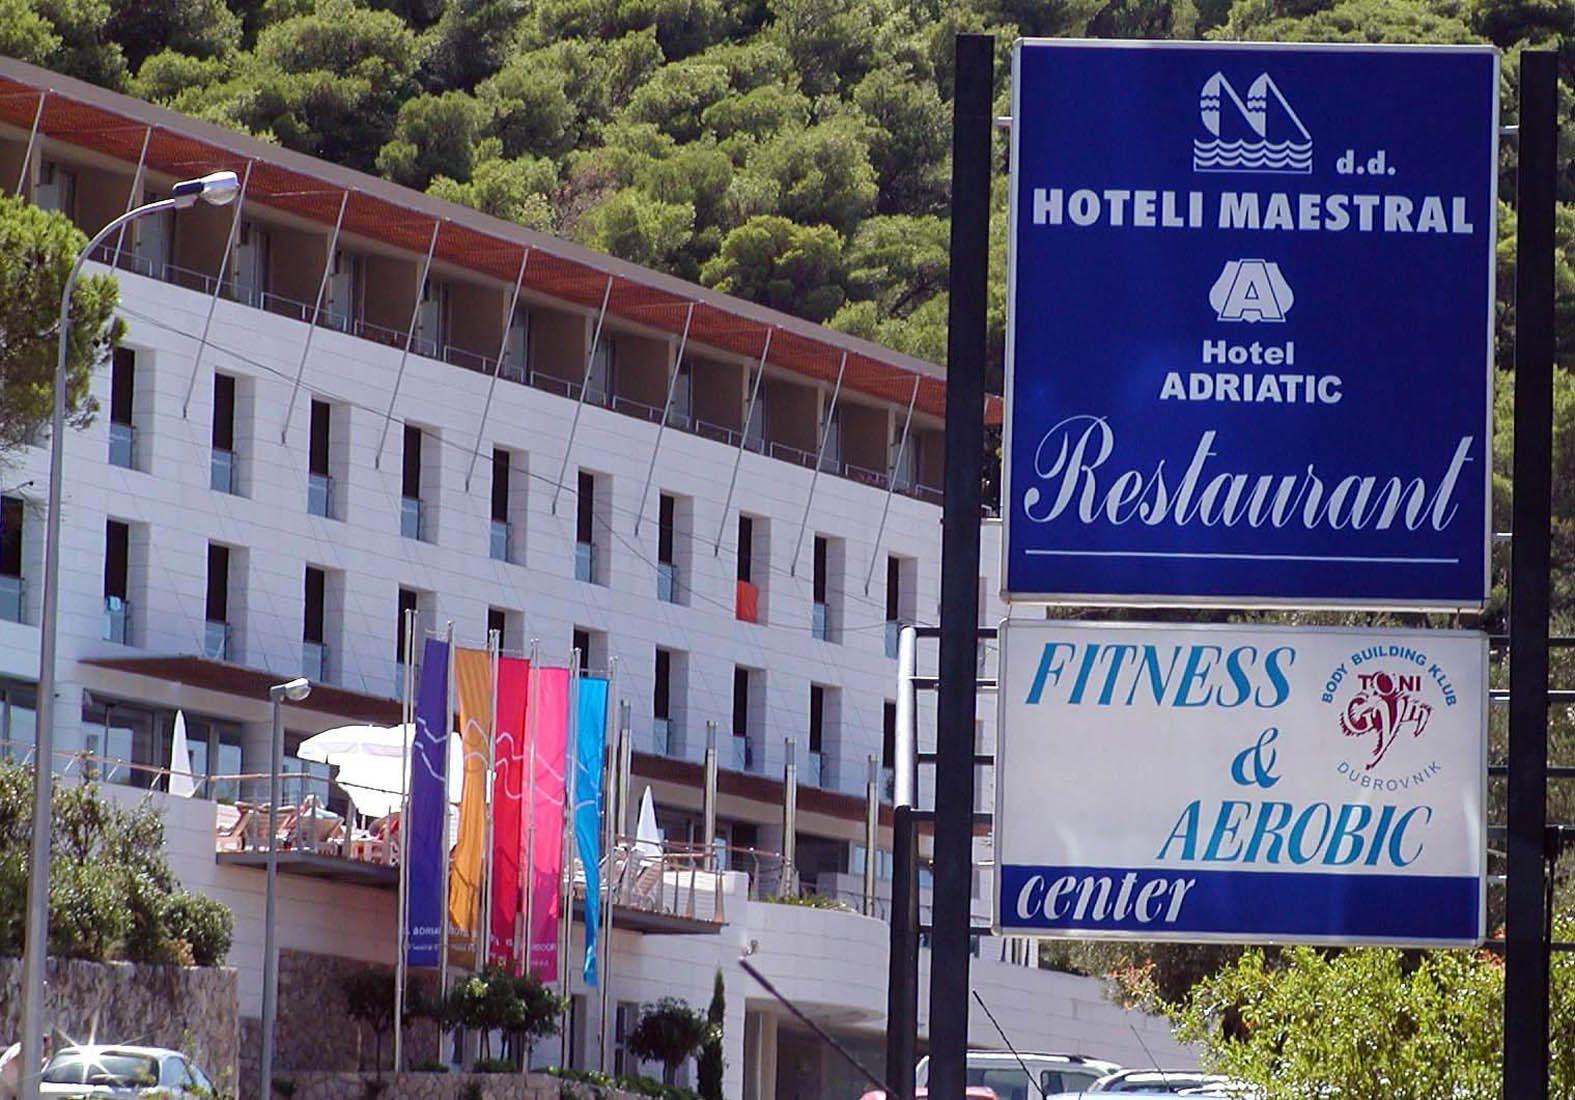 Hoteli Maestral Dubrovnik